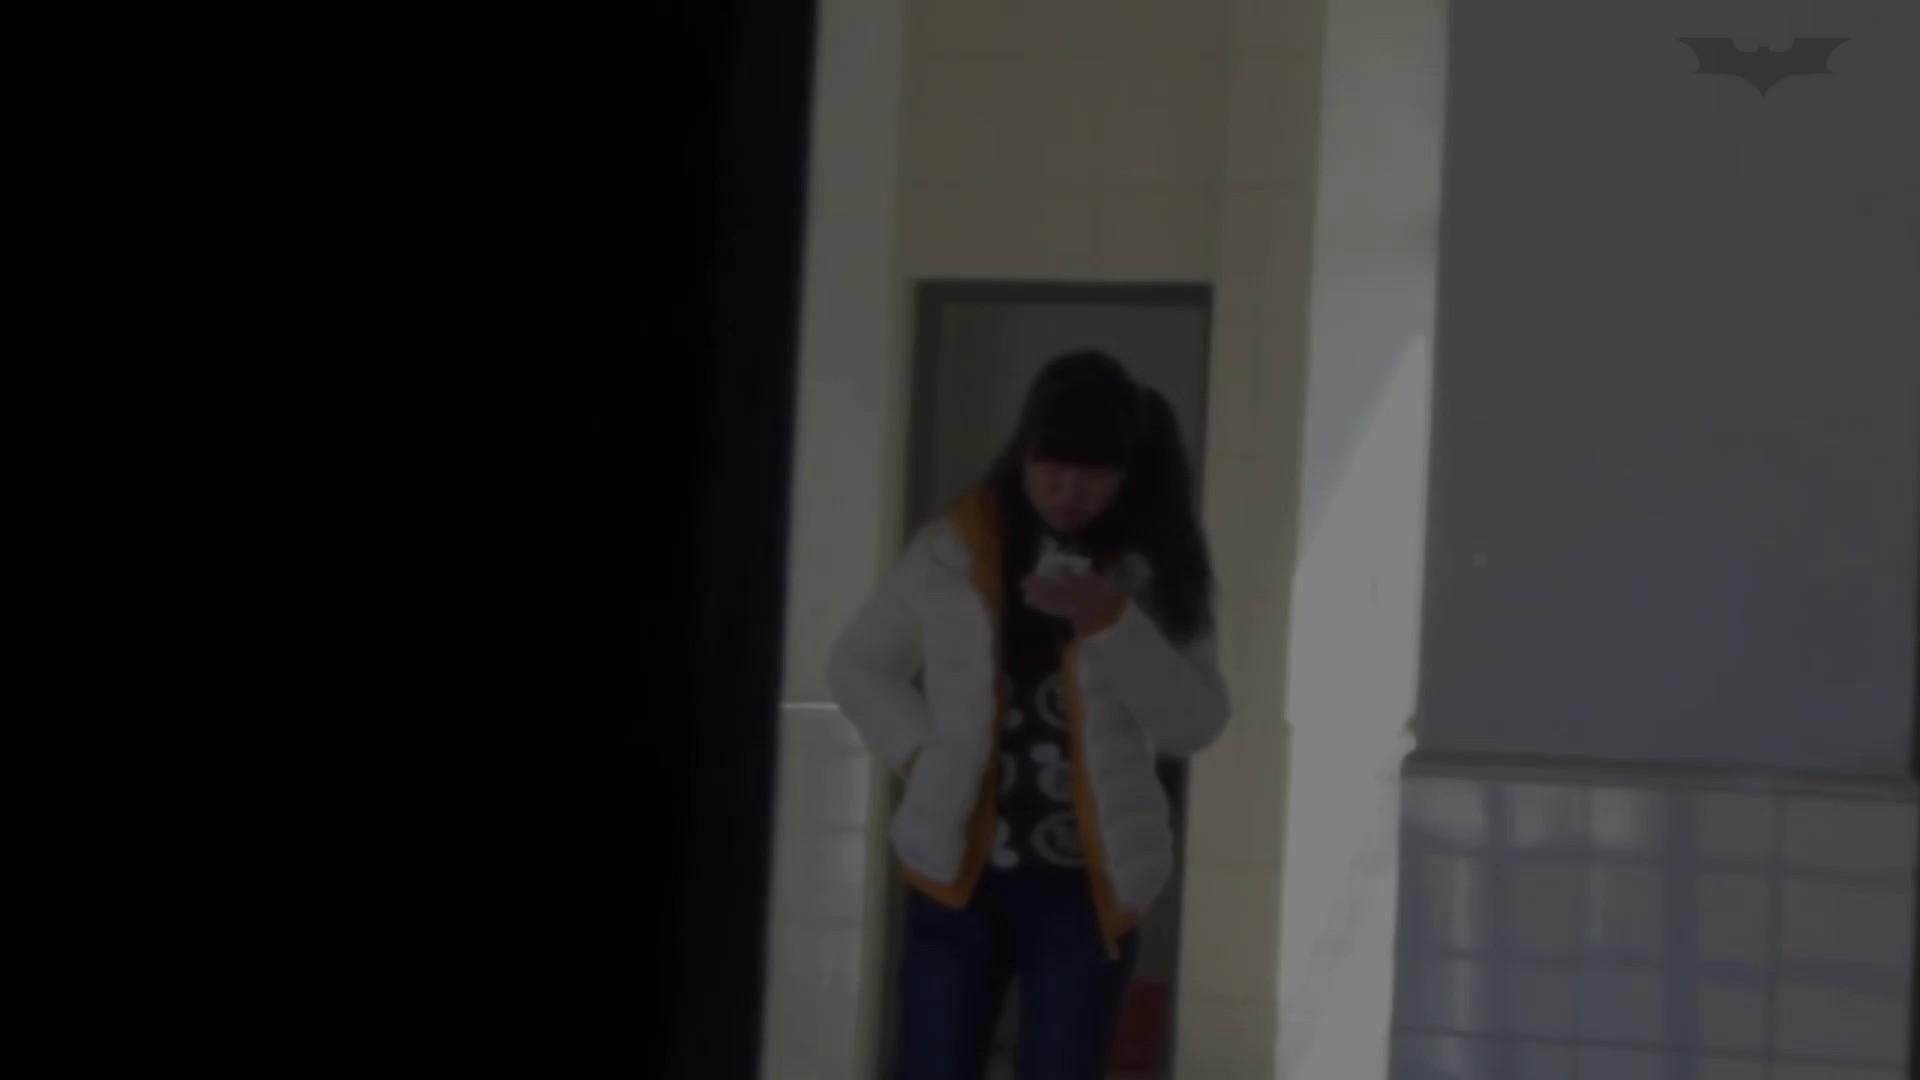 JD盗撮 美女の洗面所の秘密 Vol.42 細身女性 セックス無修正動画無料 98画像 4